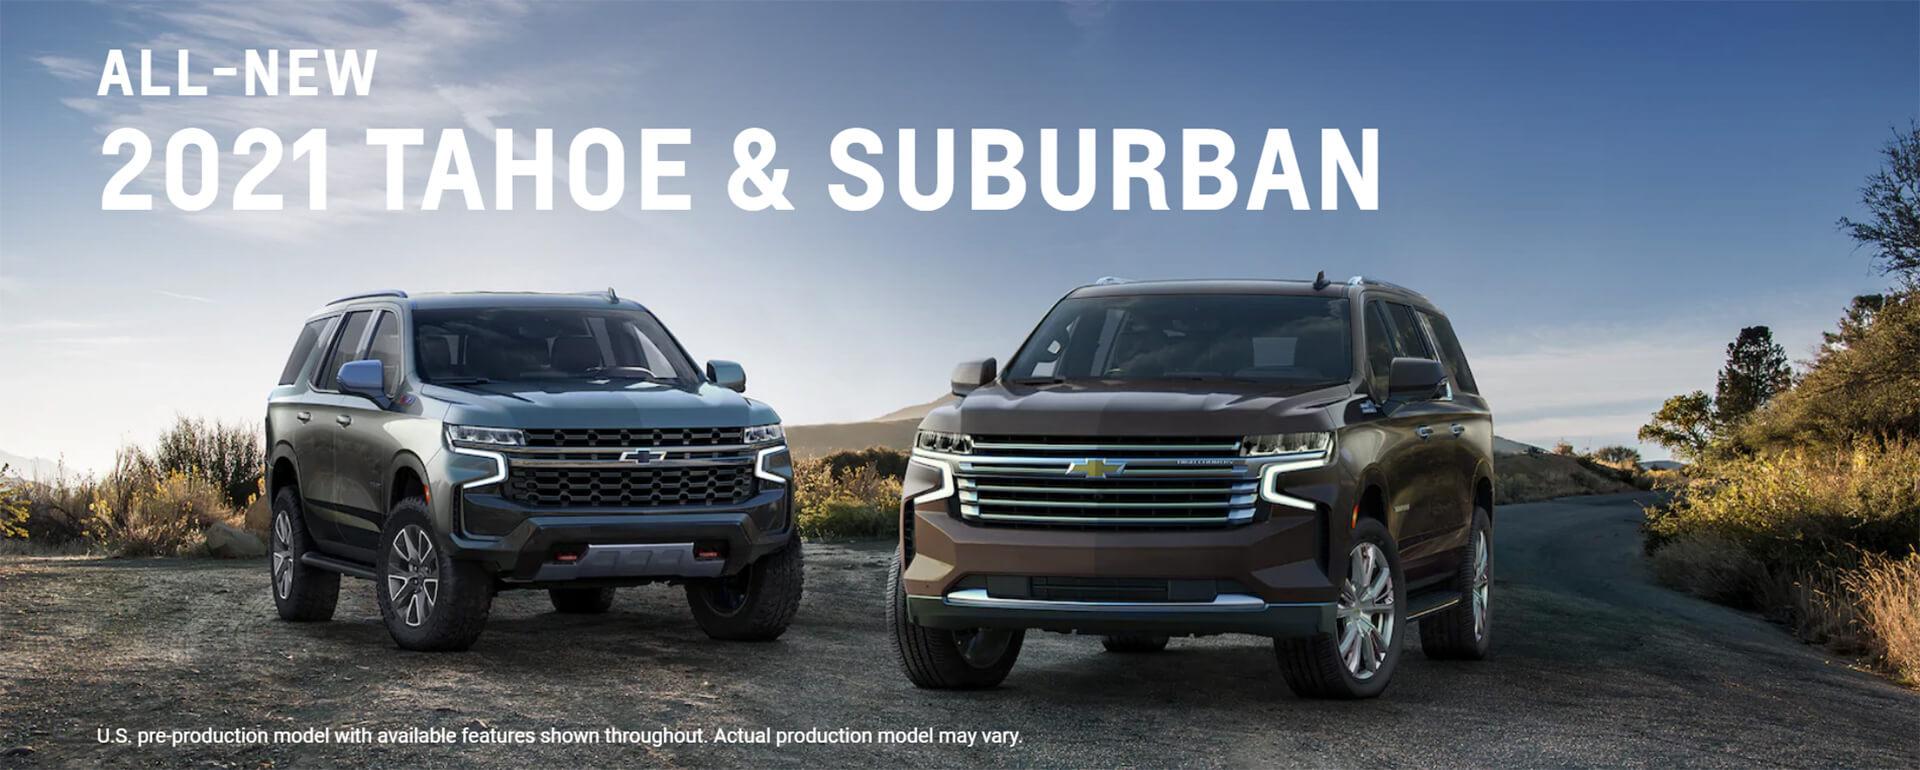 2021 Tahoe and Suburban